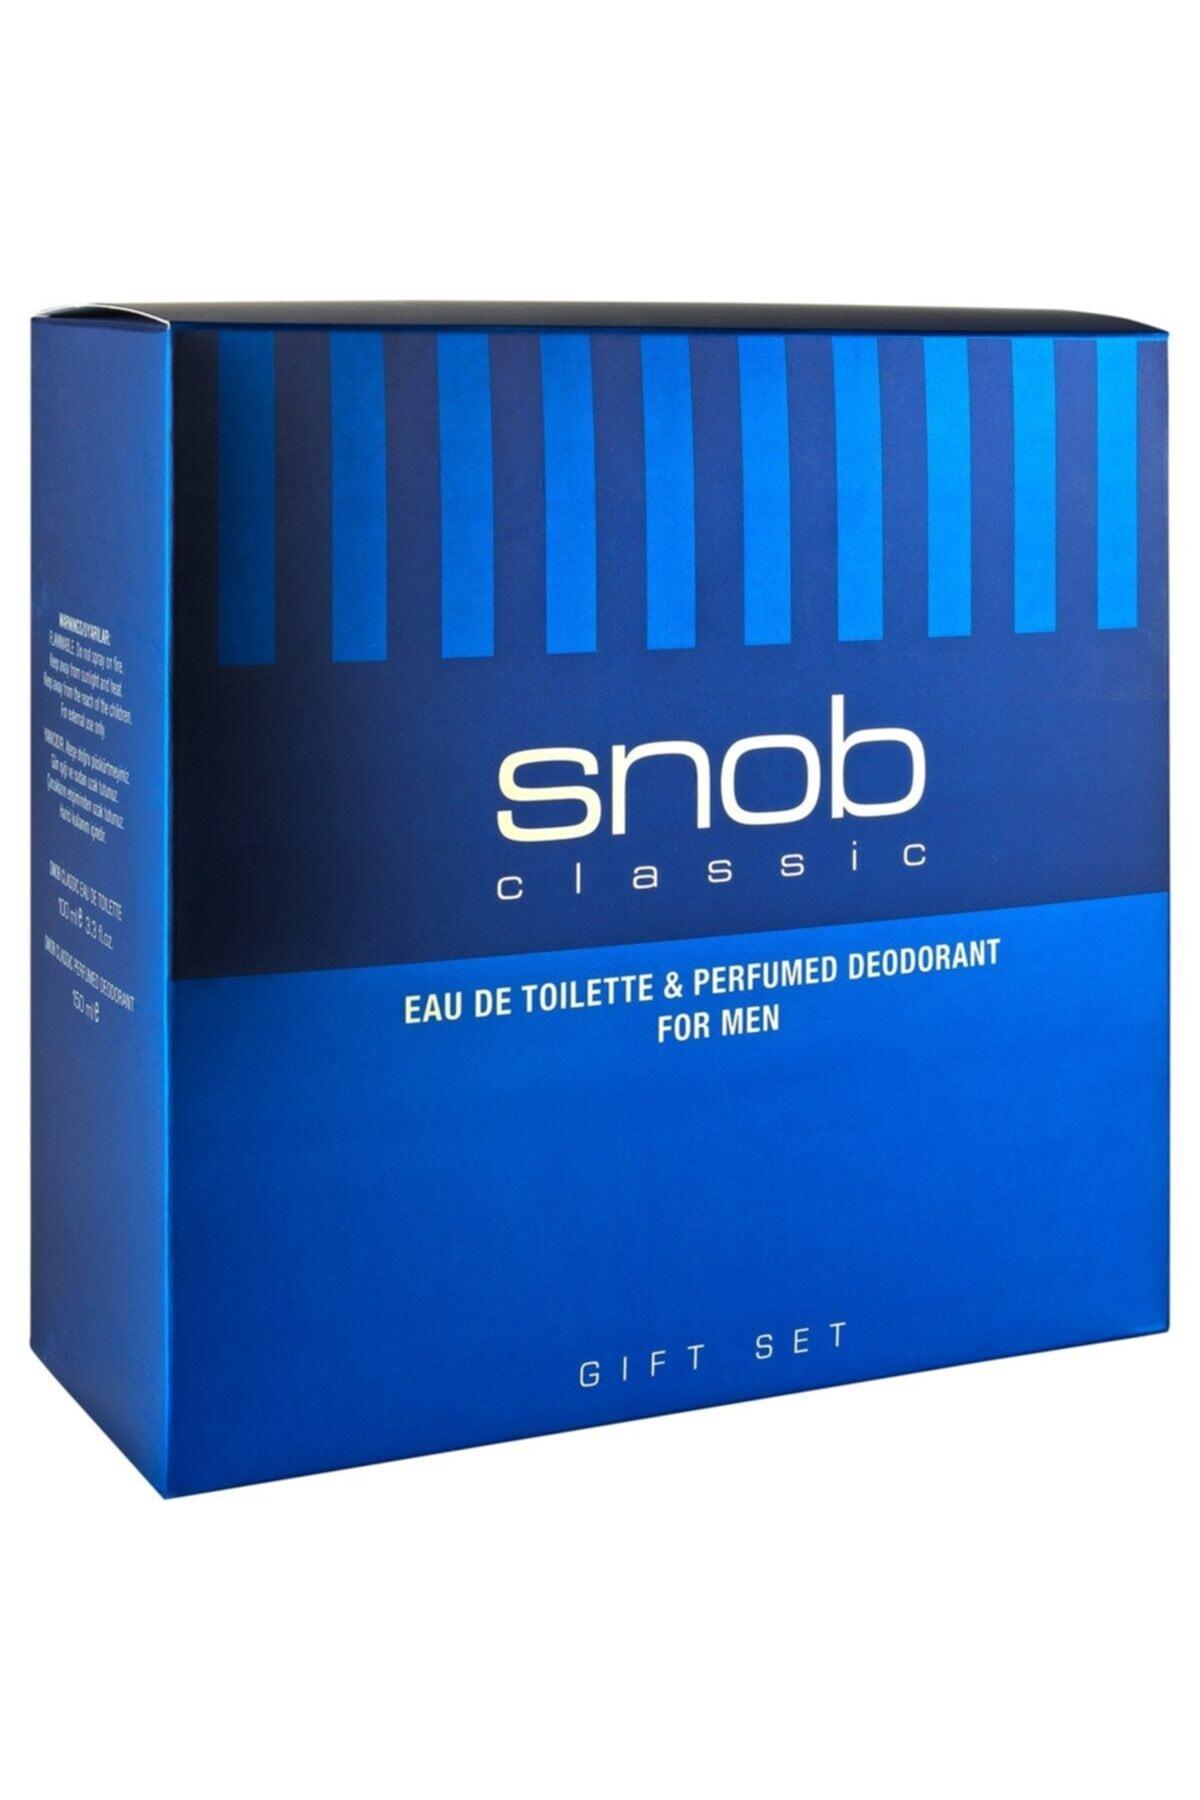 Snob Classic Erkek Parfum Seti 1